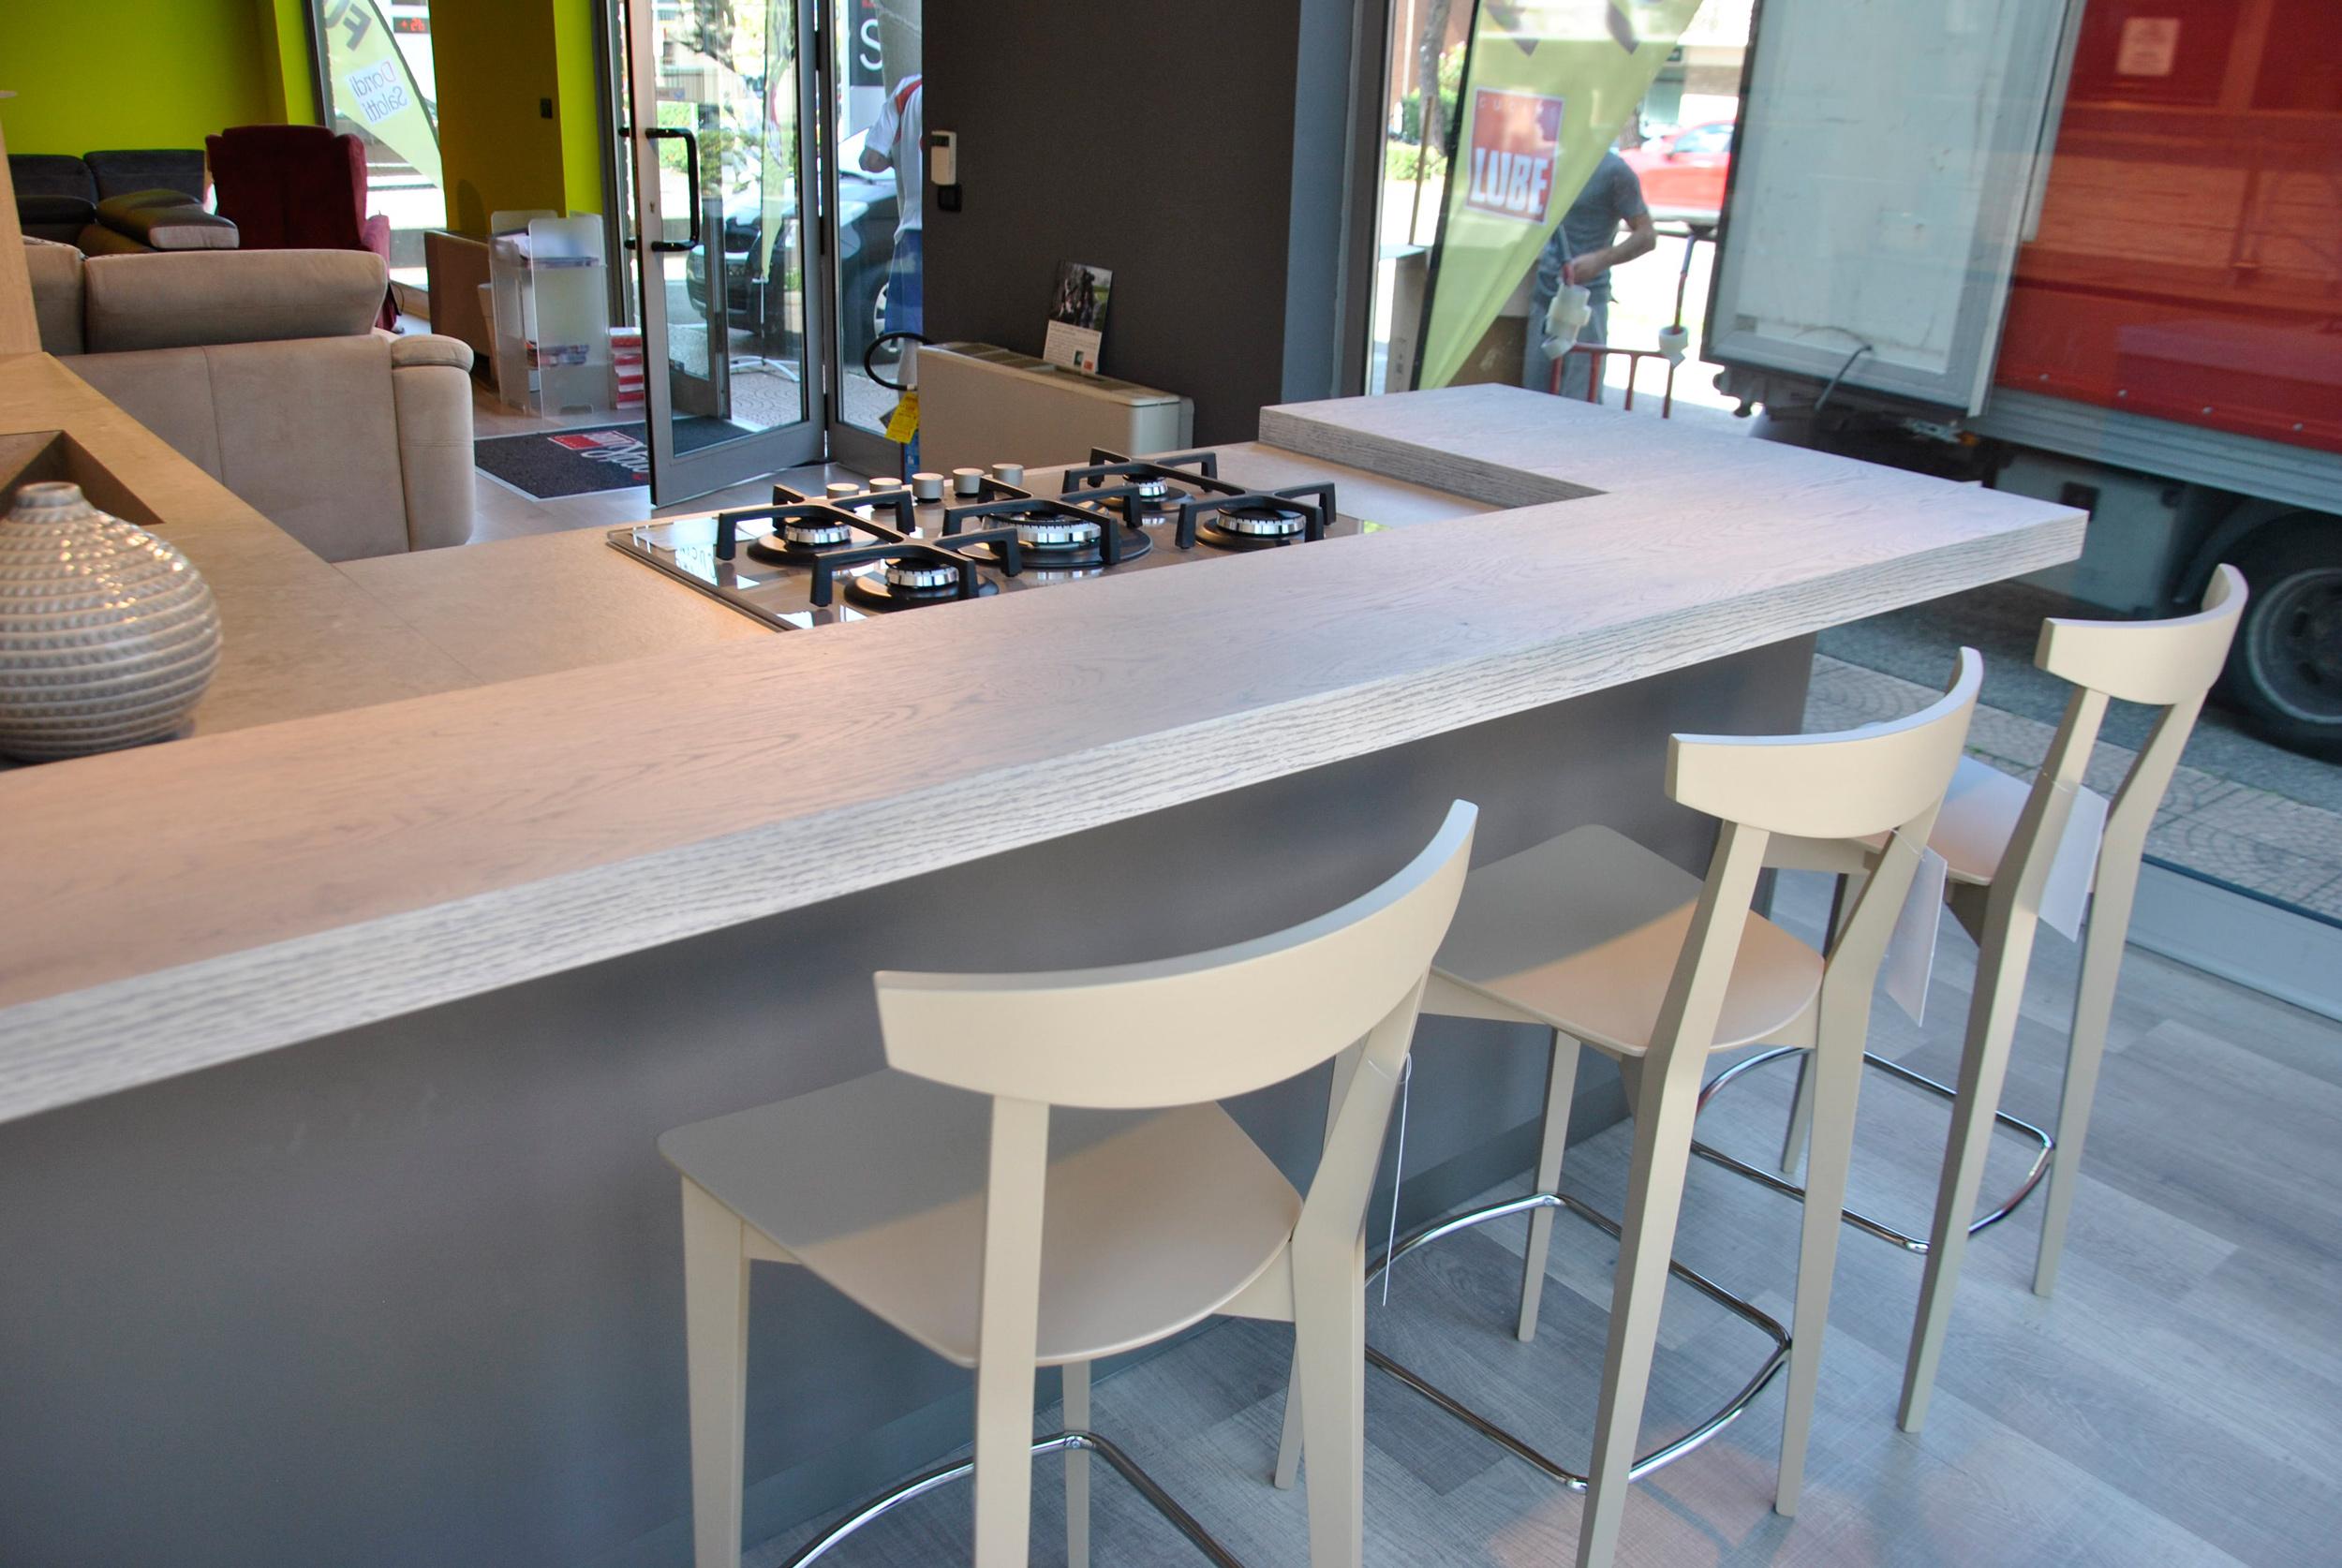 Dondi Salotti Ravenna Via Faentina.Gruppo Lube Inaugurates A New Store In Ravenna Cucine Lube